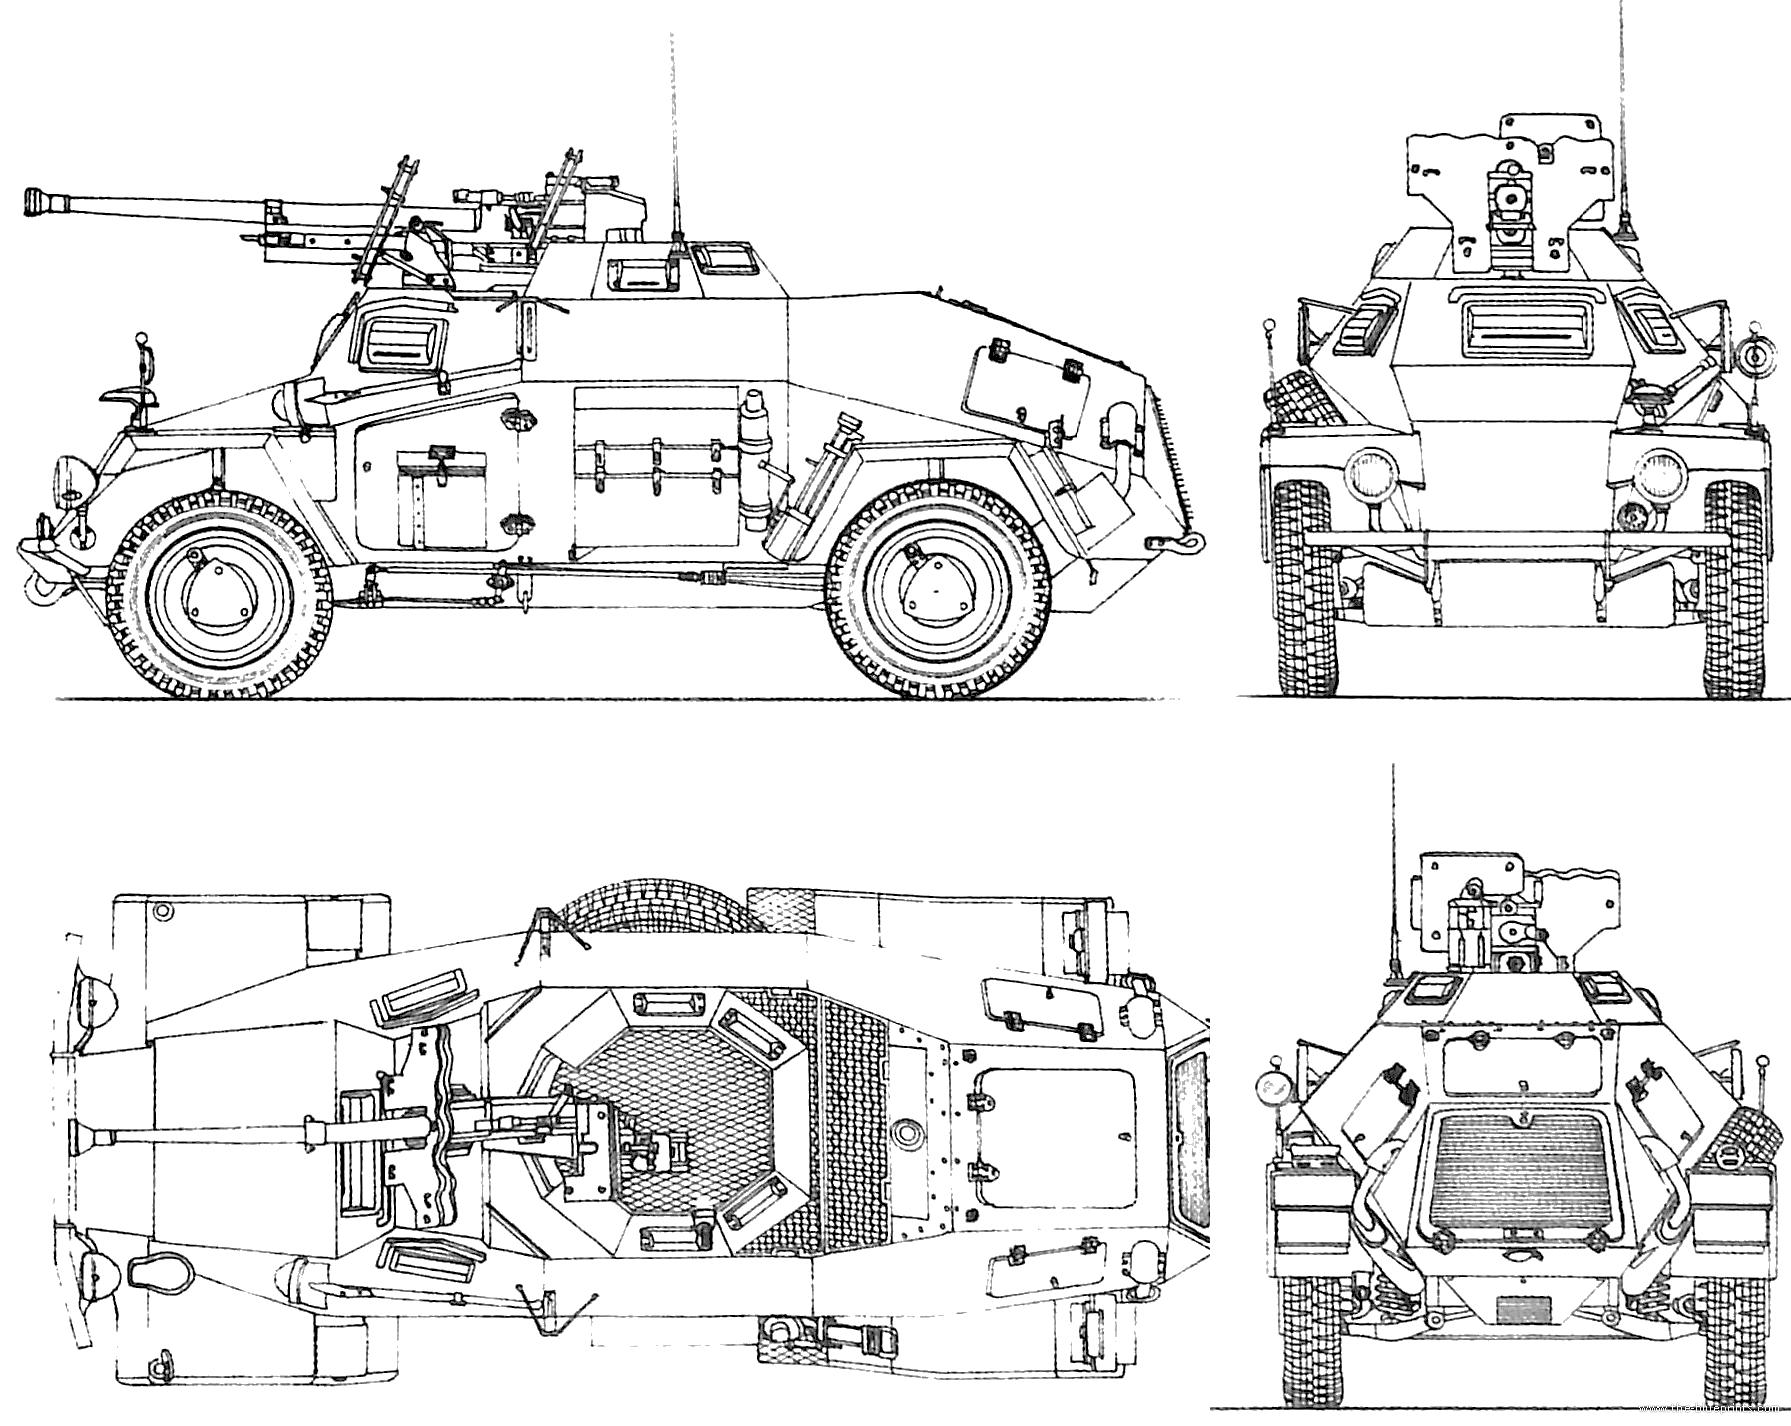 Бронеавтомобиль лб-нати (ба-нати) | армии и солдаты. военная энциклопедия